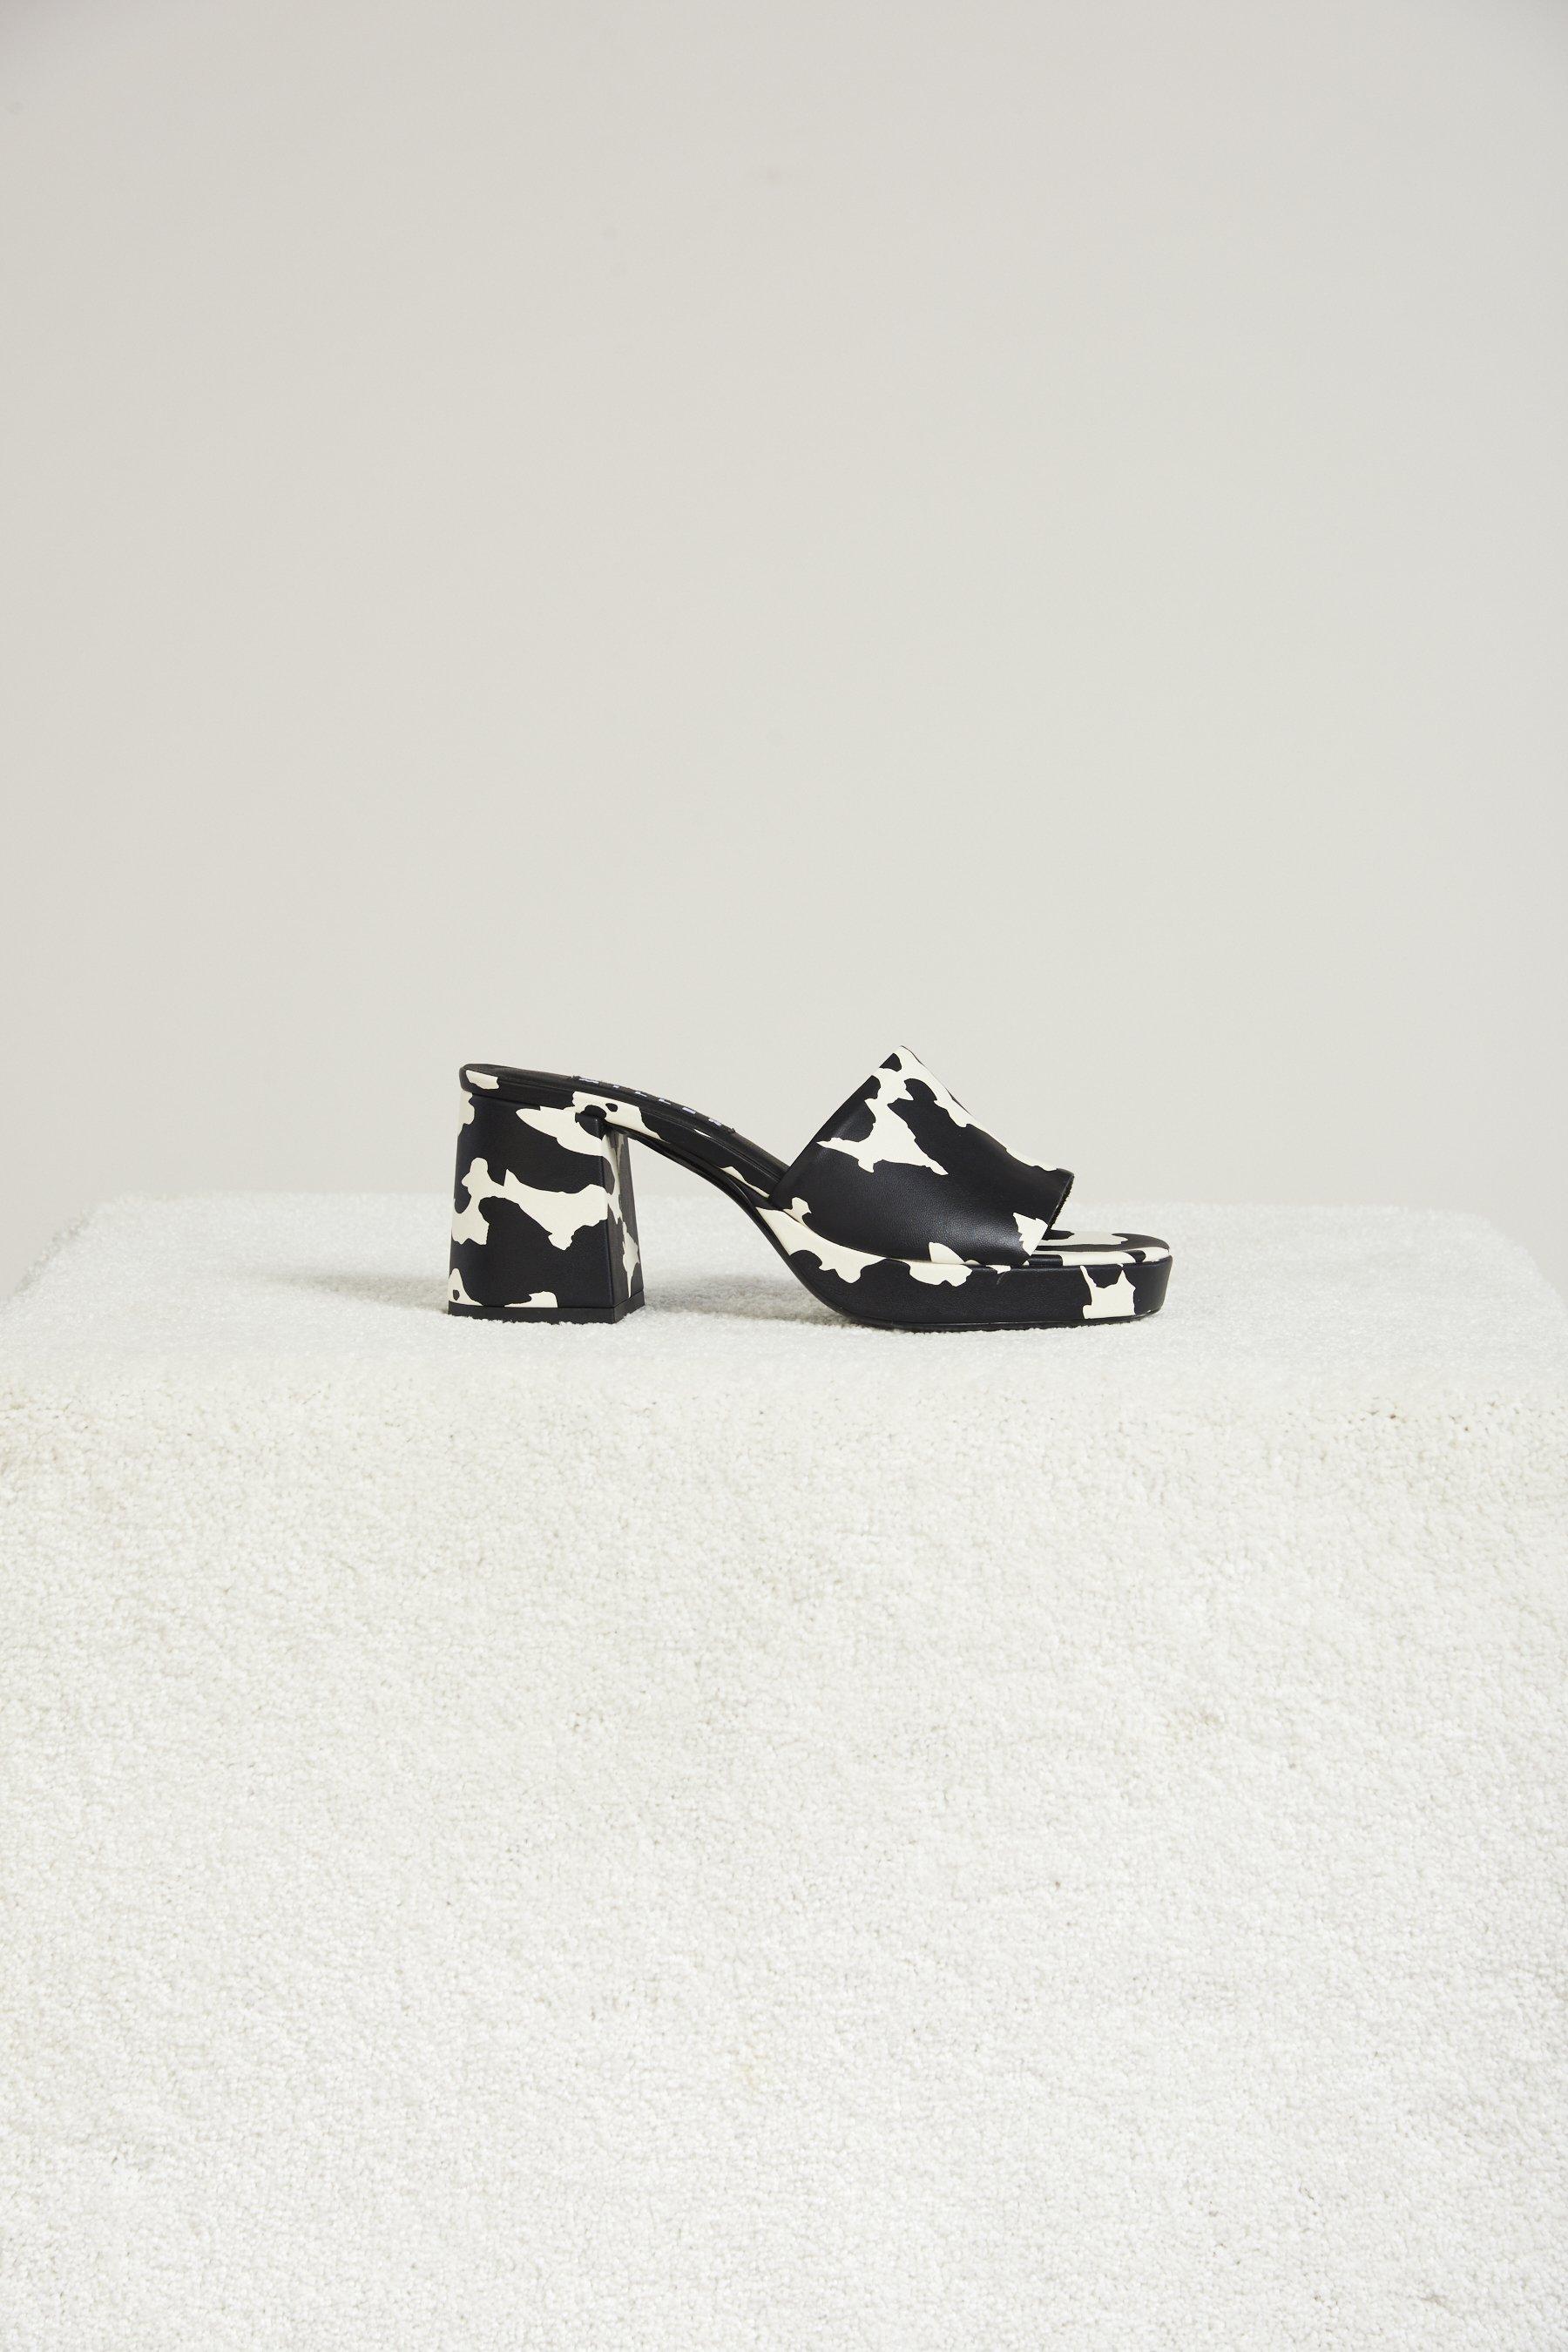 Stopper Heel In Cow Print by Simon Miller - 1